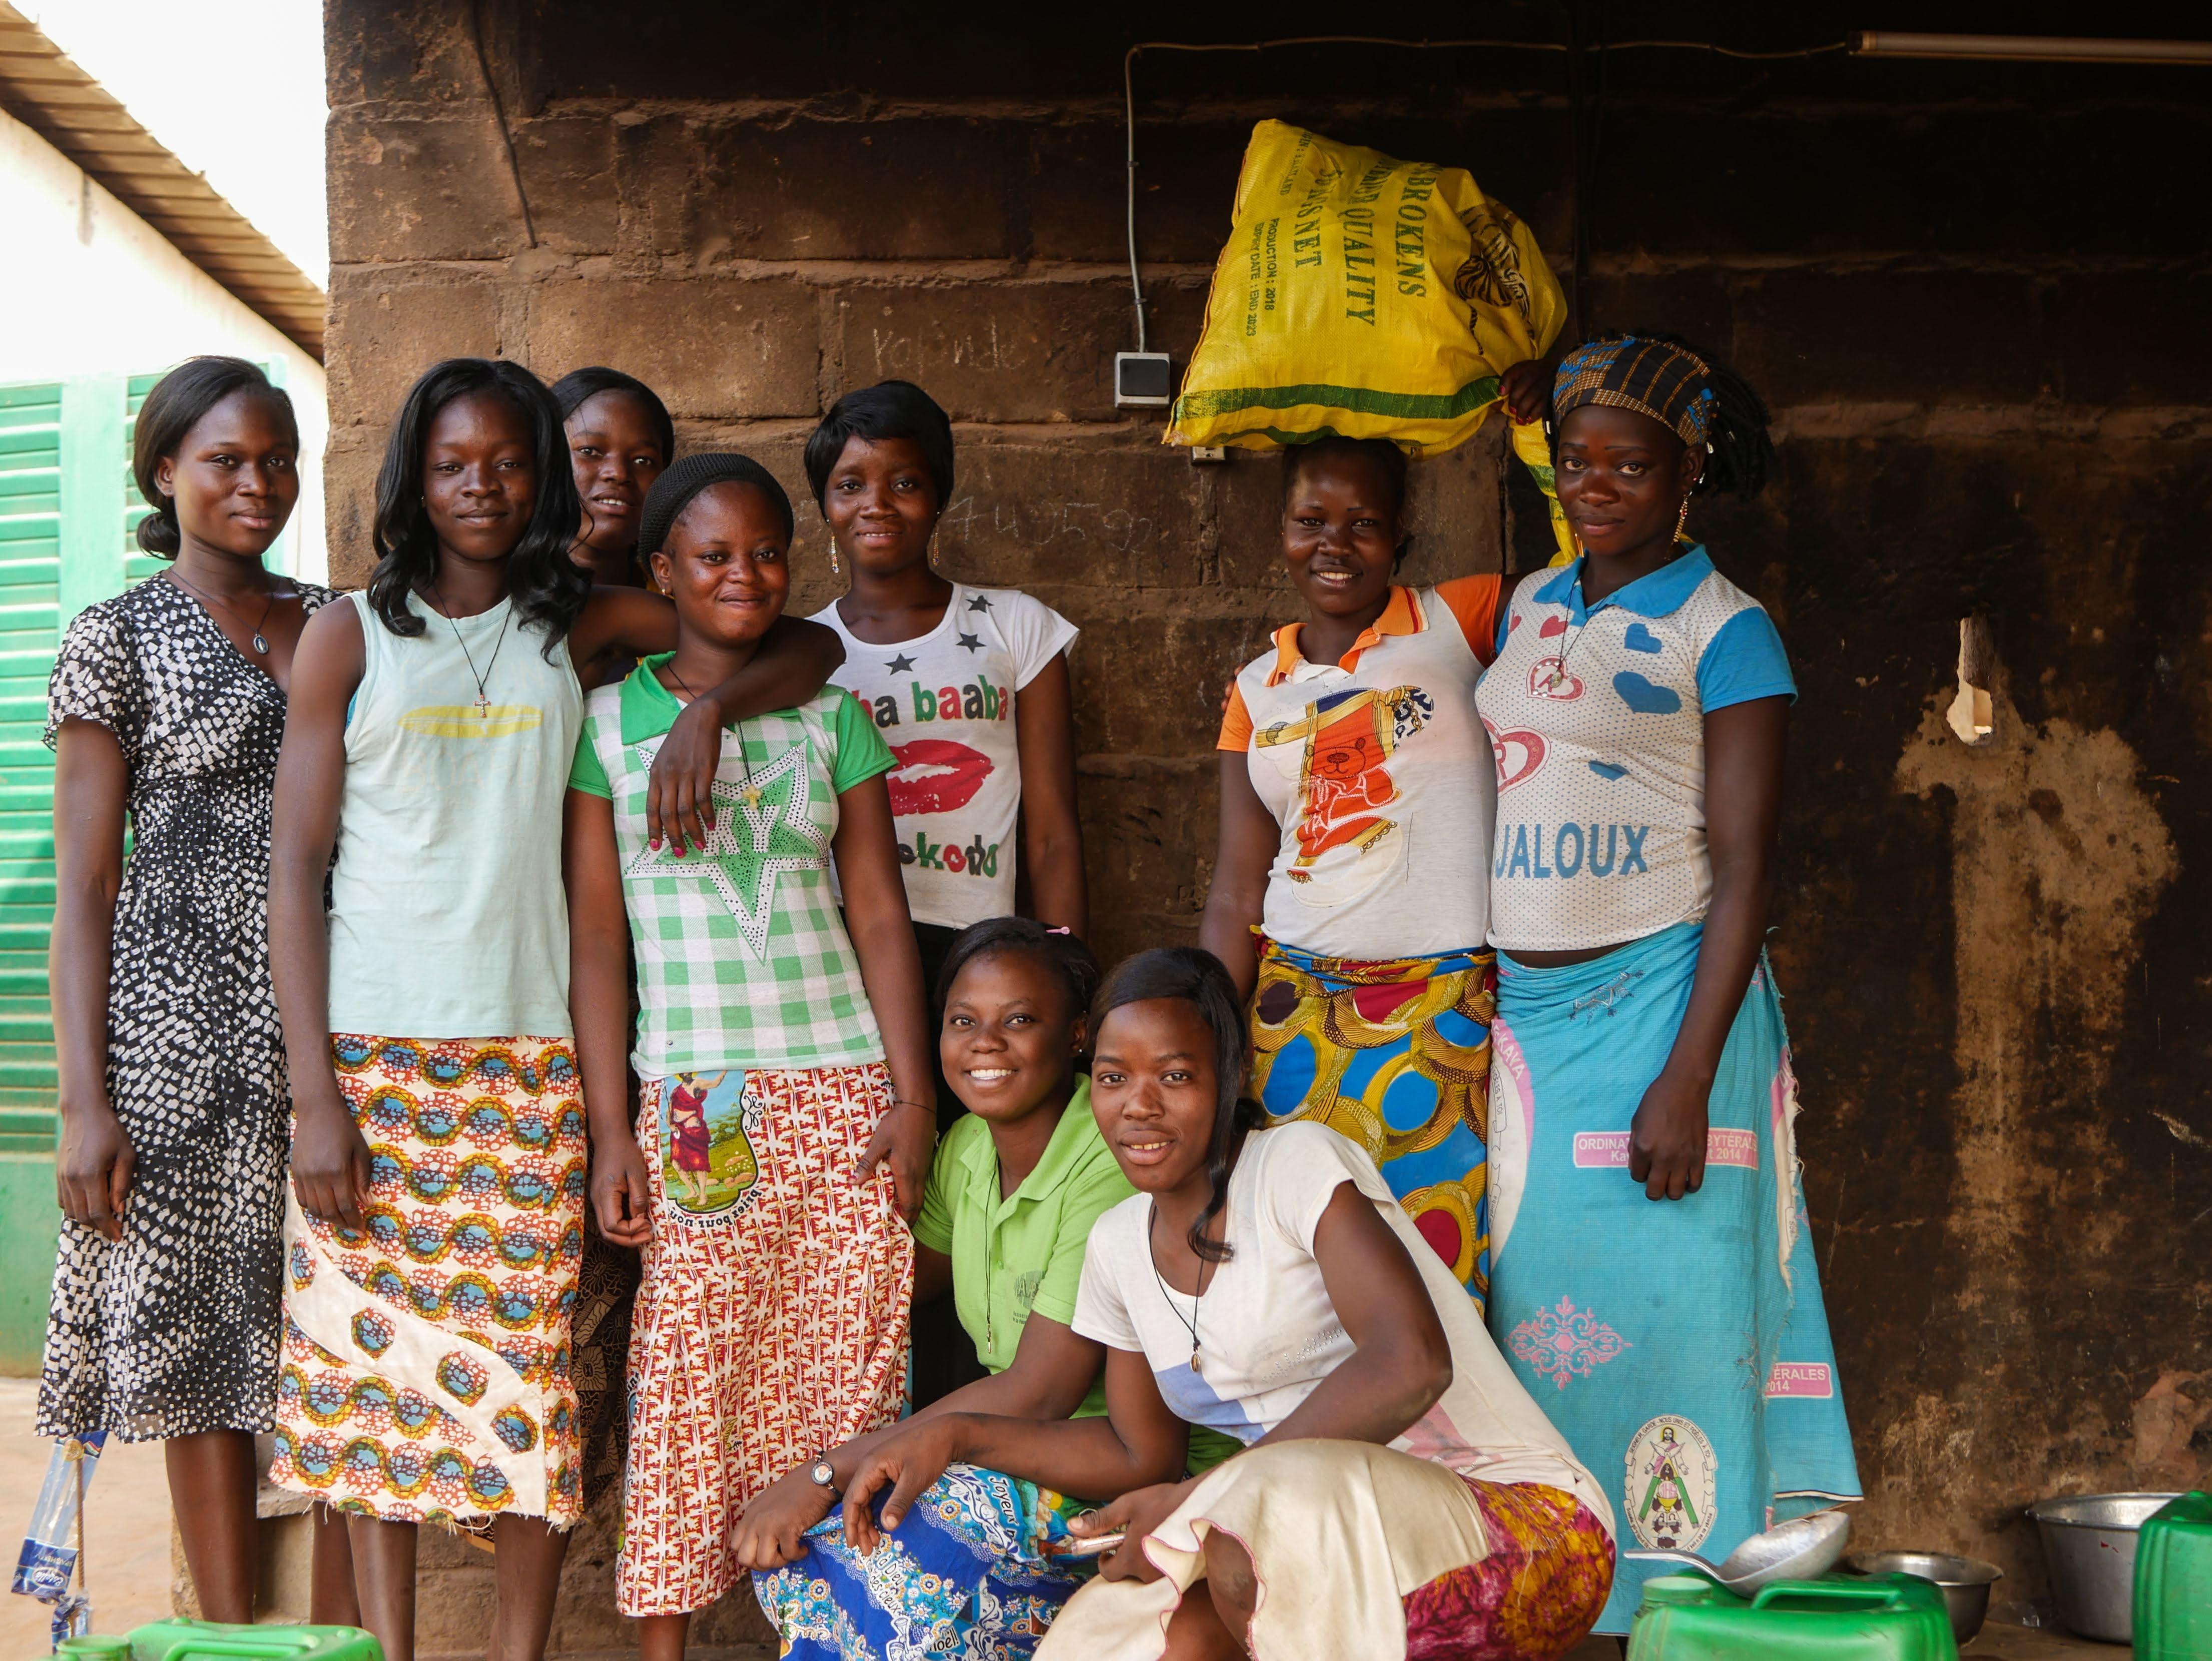 [Reportage] Un foyer contre le mariage forcé au Burkina Faso